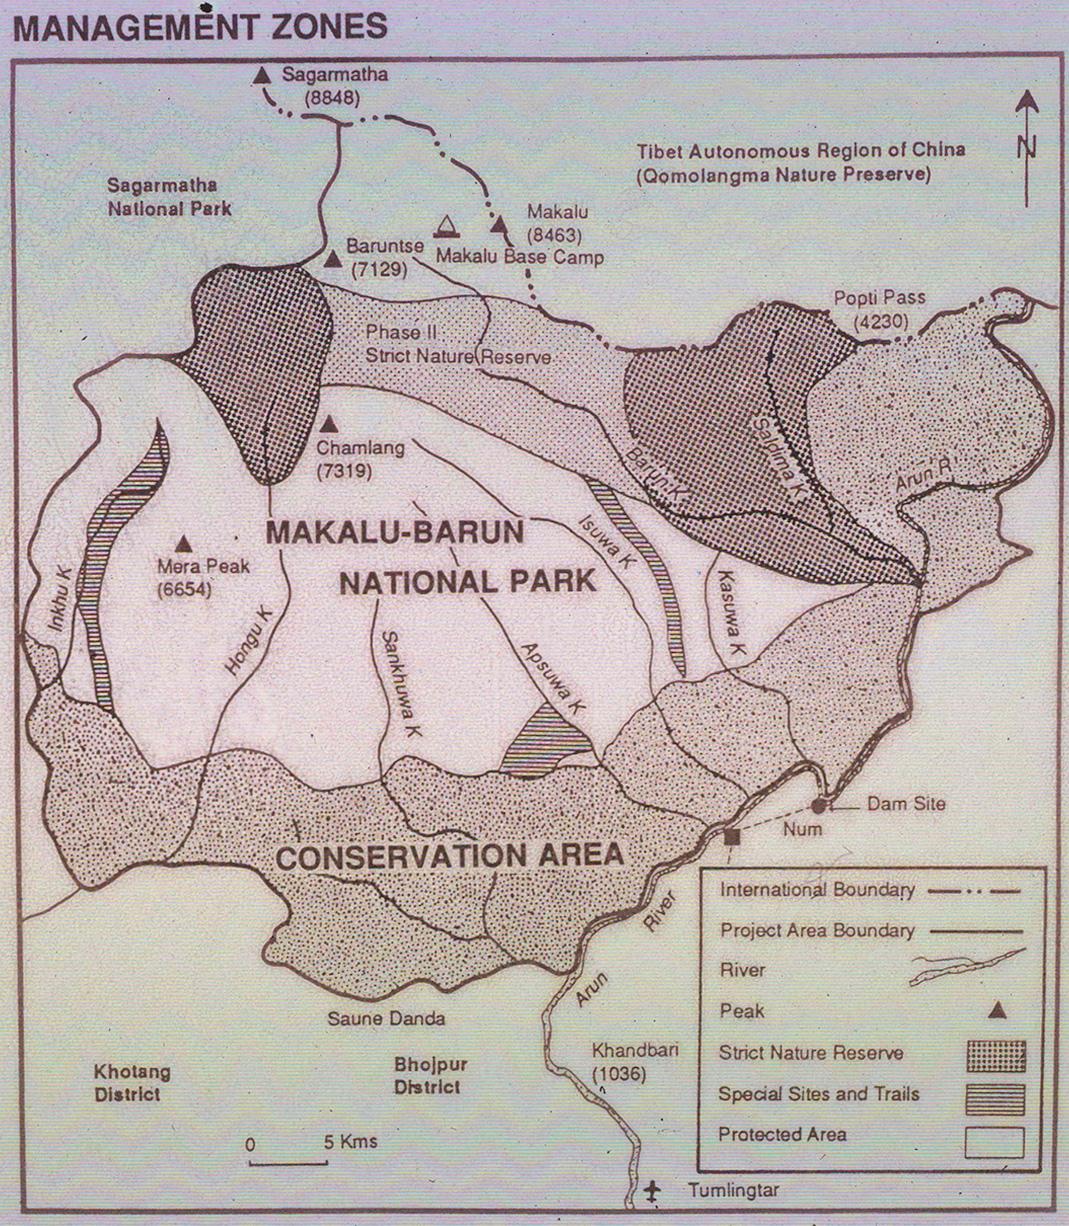 MakaluBarun National Park